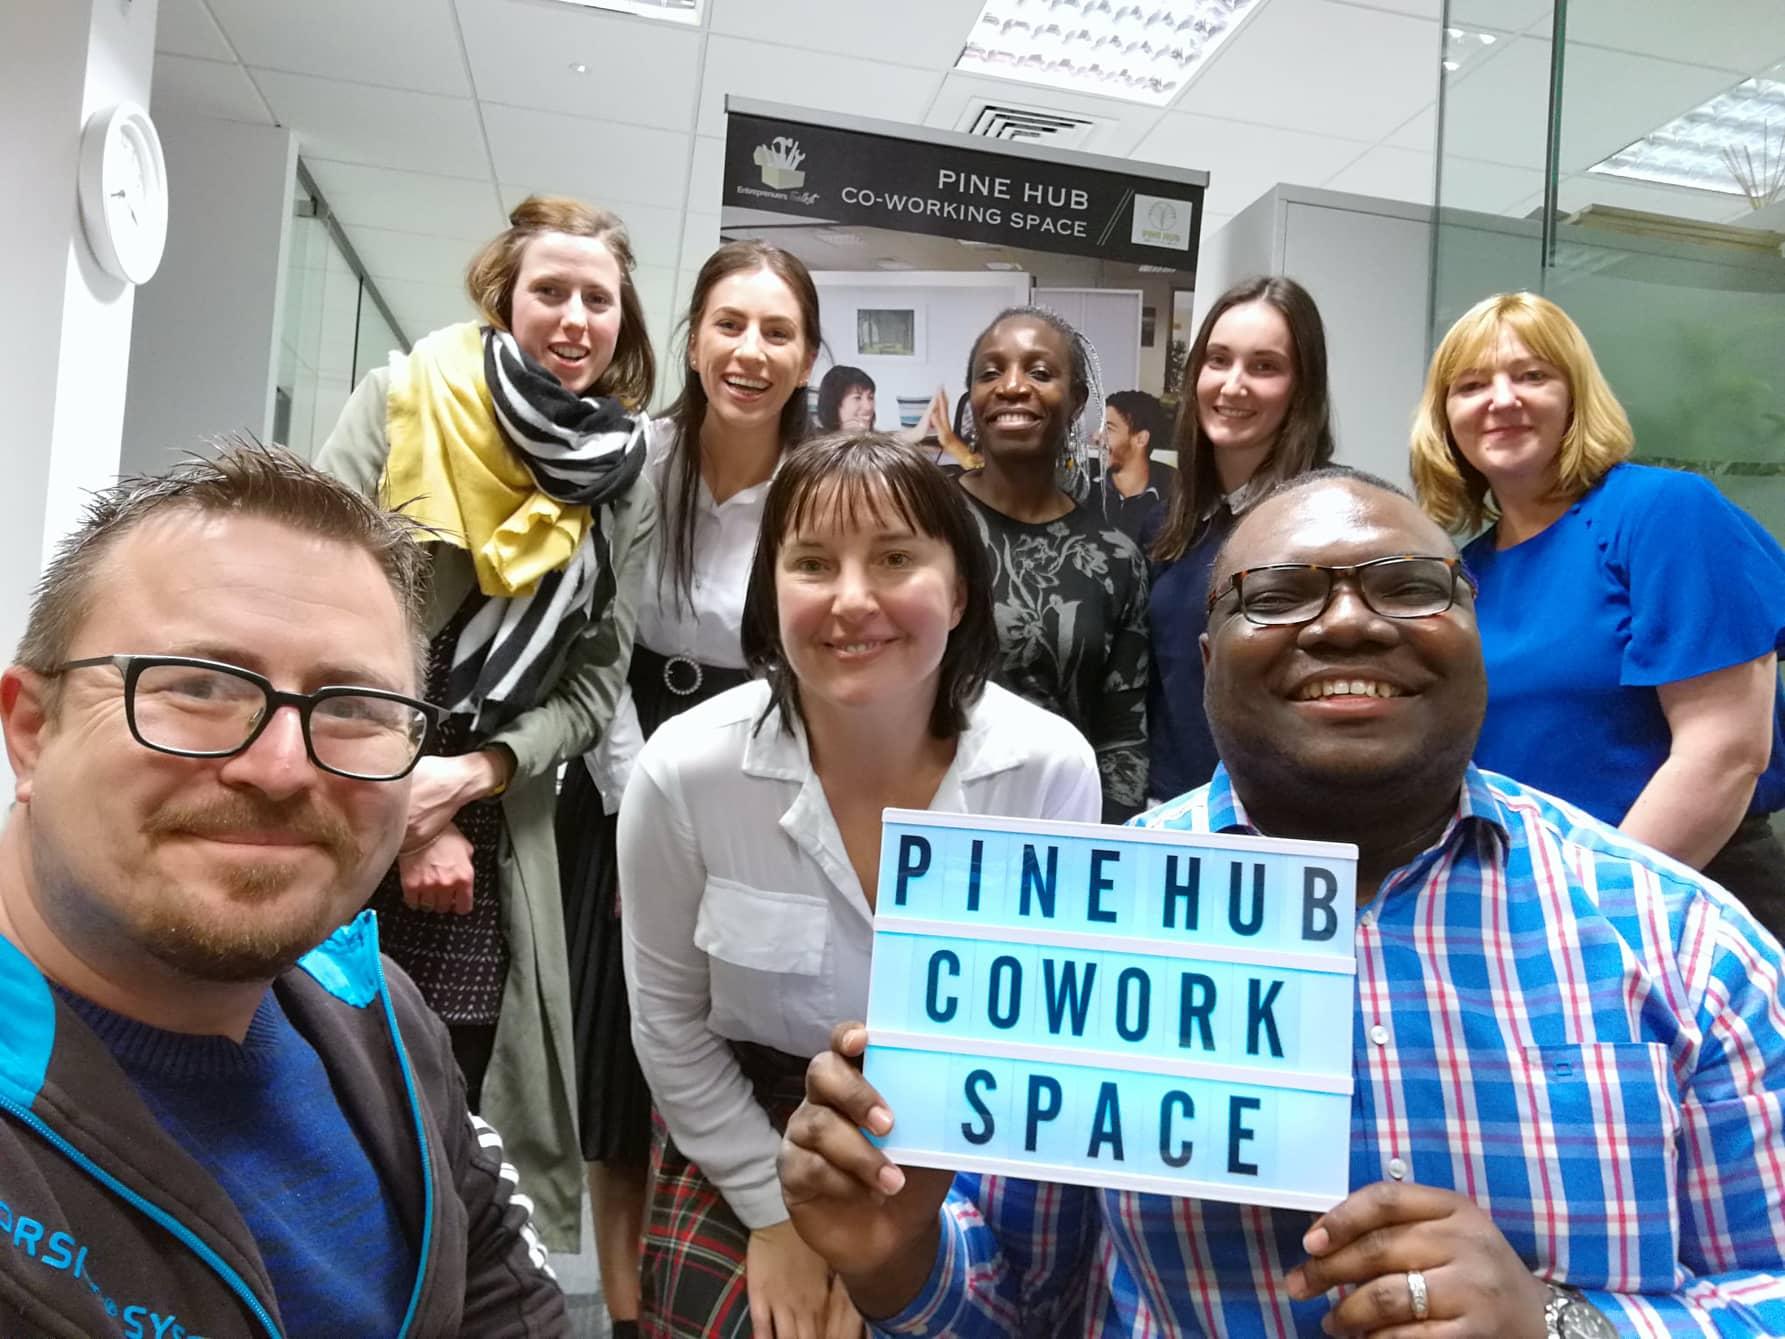 Pine Hub, Dublin